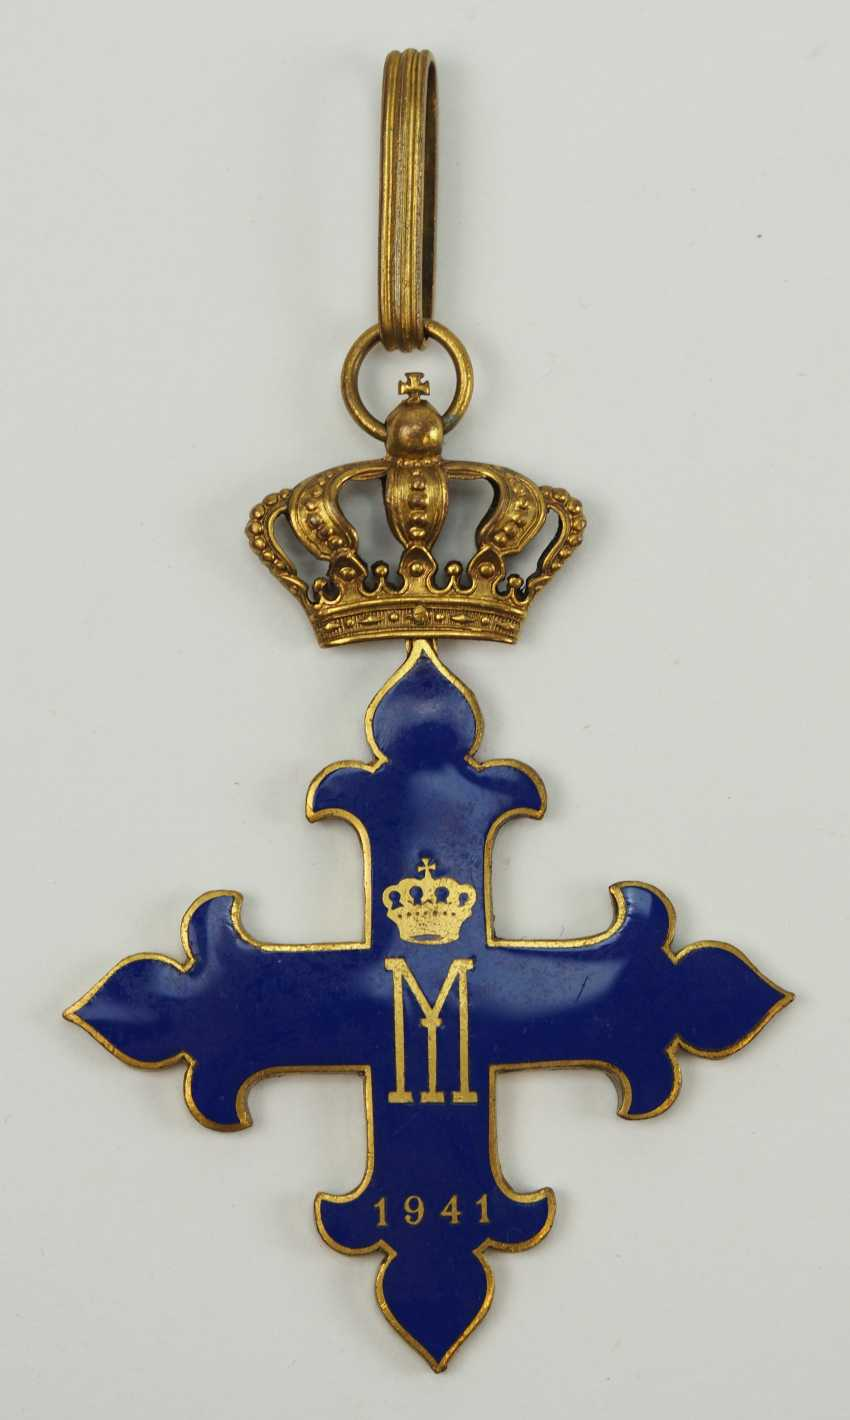 Romania: order of Michael the Brave, 2. Model (1941-1944), 2. Class. - photo 1